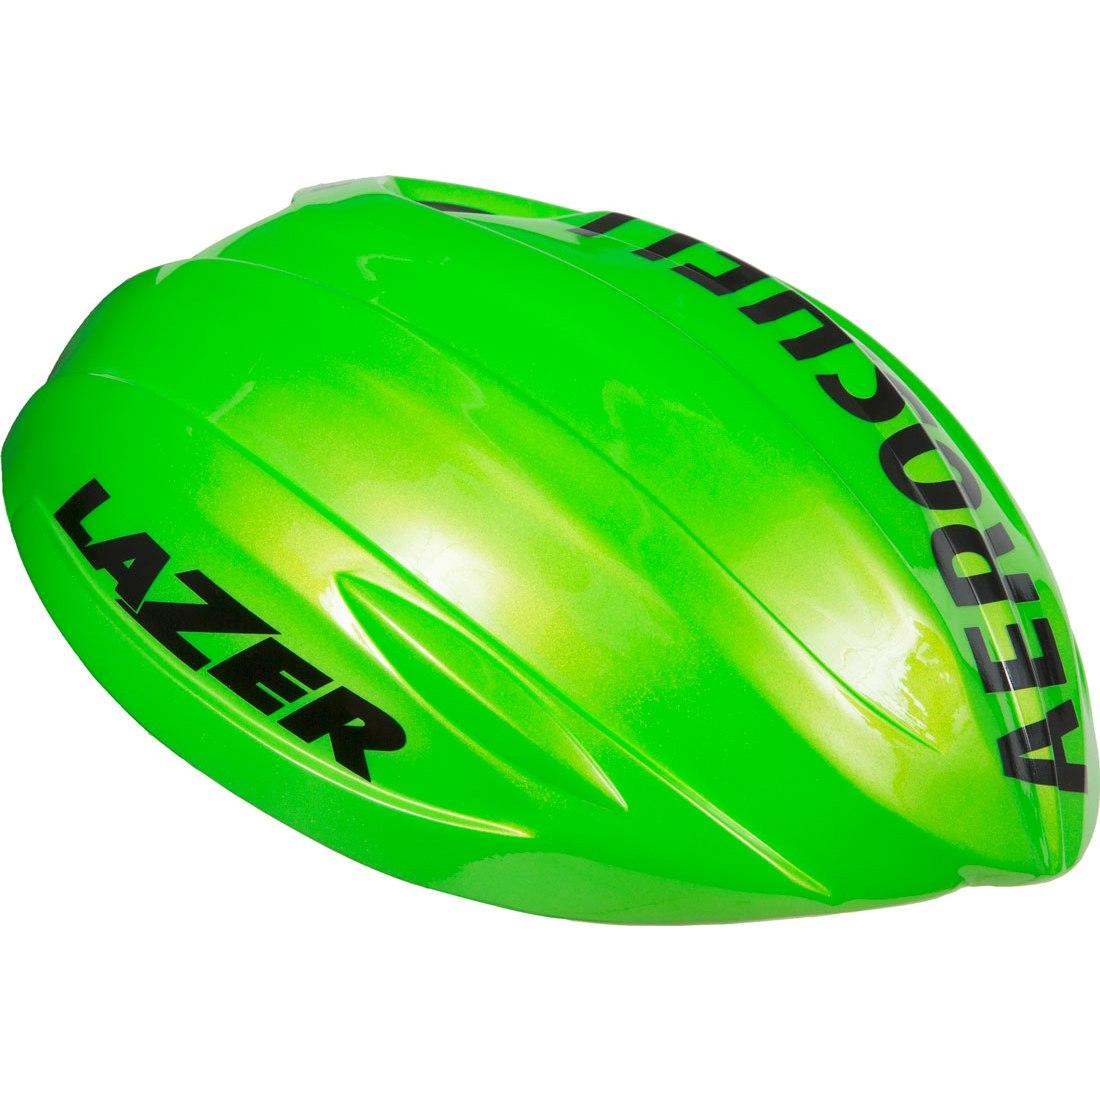 Lazer Aeroshell for Blade - flash green